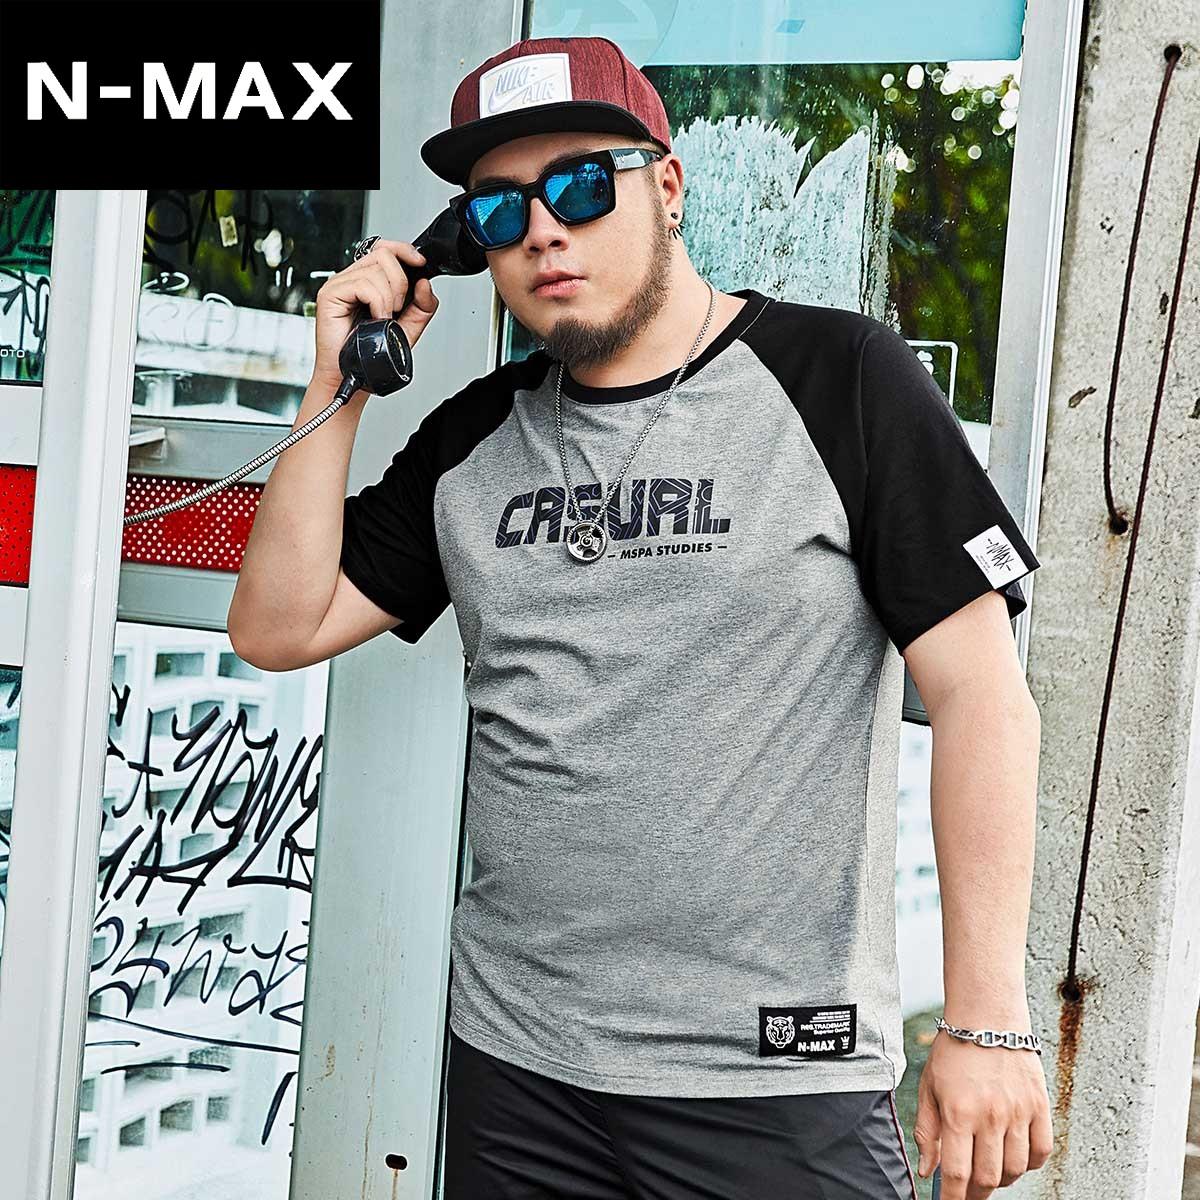 NMAX大码男装潮牌 胖子夏季宽松半袖休闲T恤加肥加大圆领短袖体恤